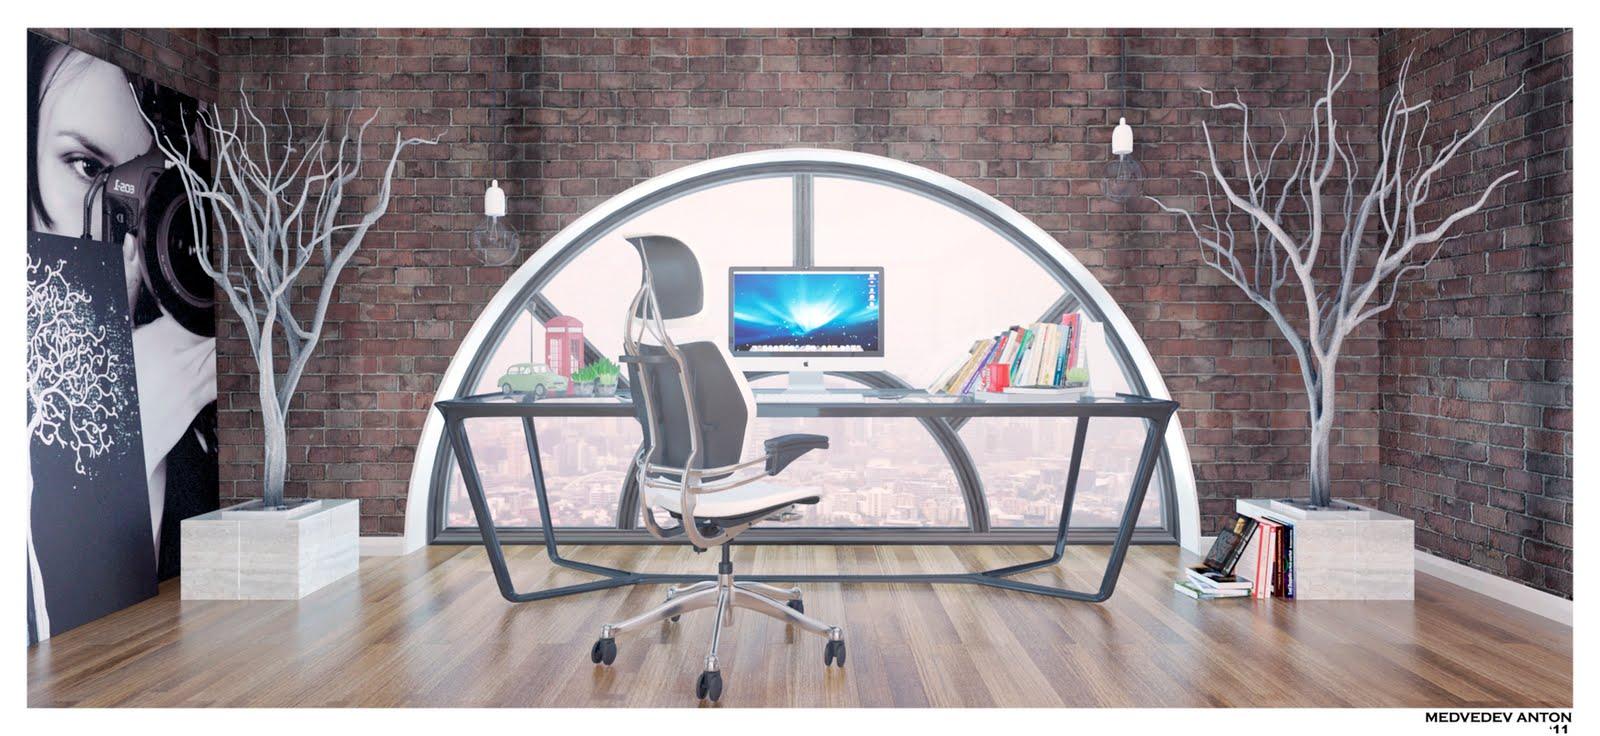 Разработка дизайна интерьера комнаты фото f_3925a3450d55661e.jpg